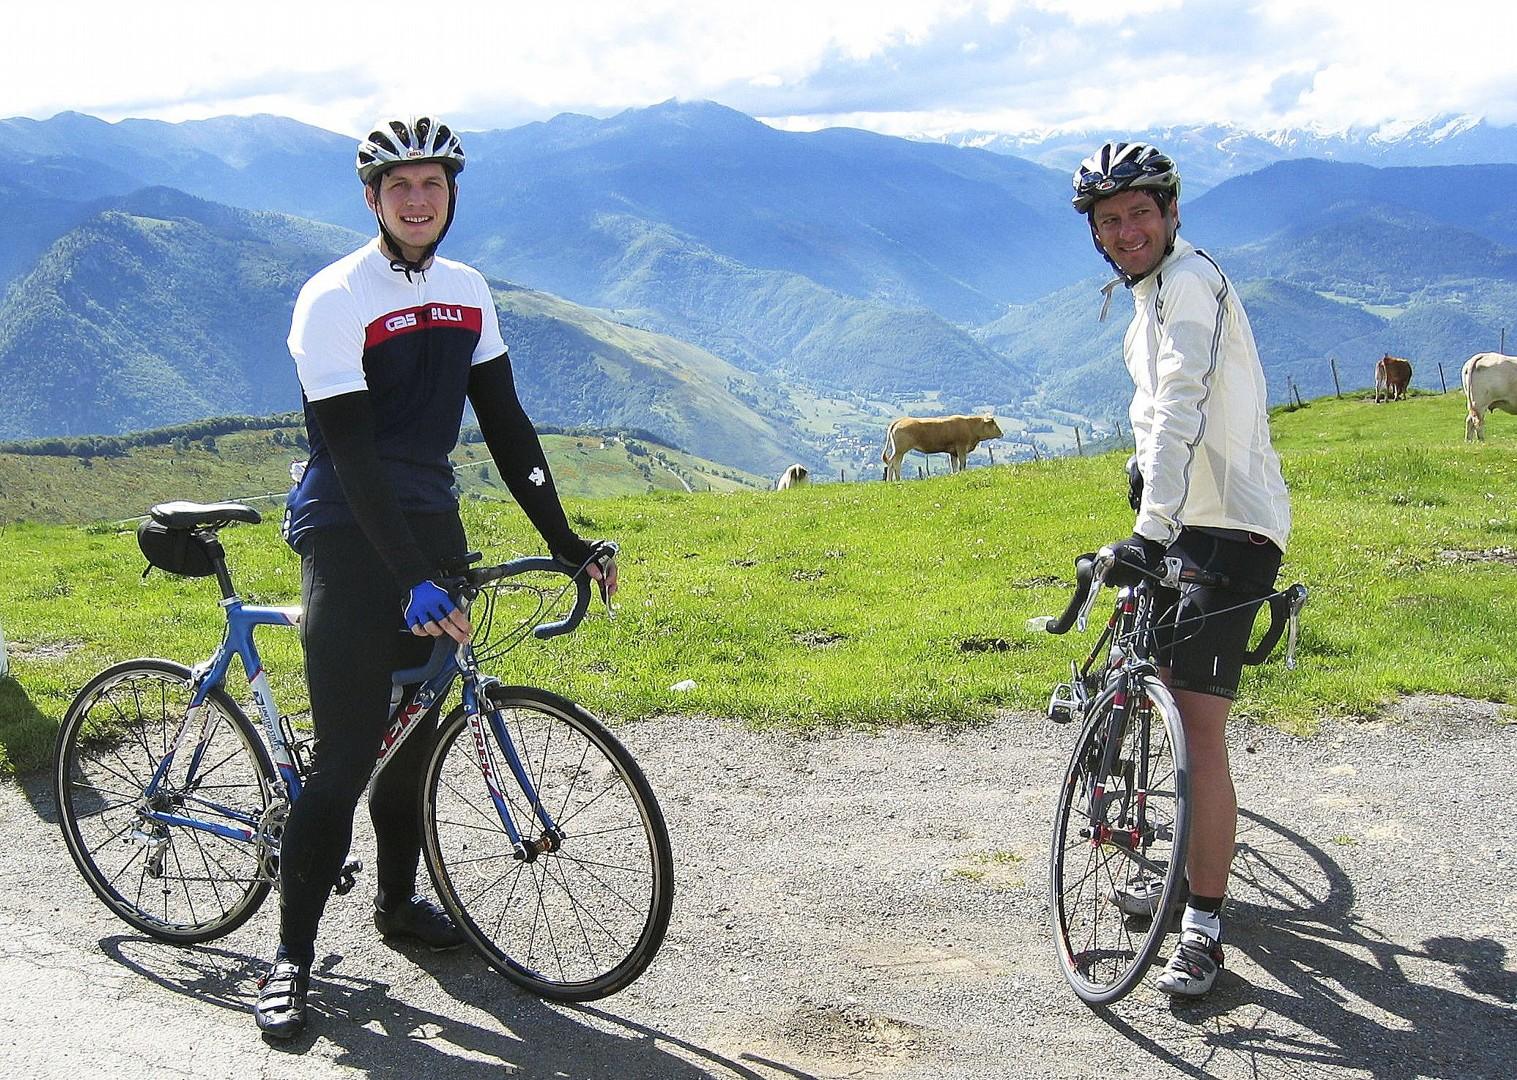 france-guided-road-cycling-holiday.jpg - France - Pyrenees Fitness Week - Guided Road Cycling Holiday (Grade 3-4) - Road Cycling